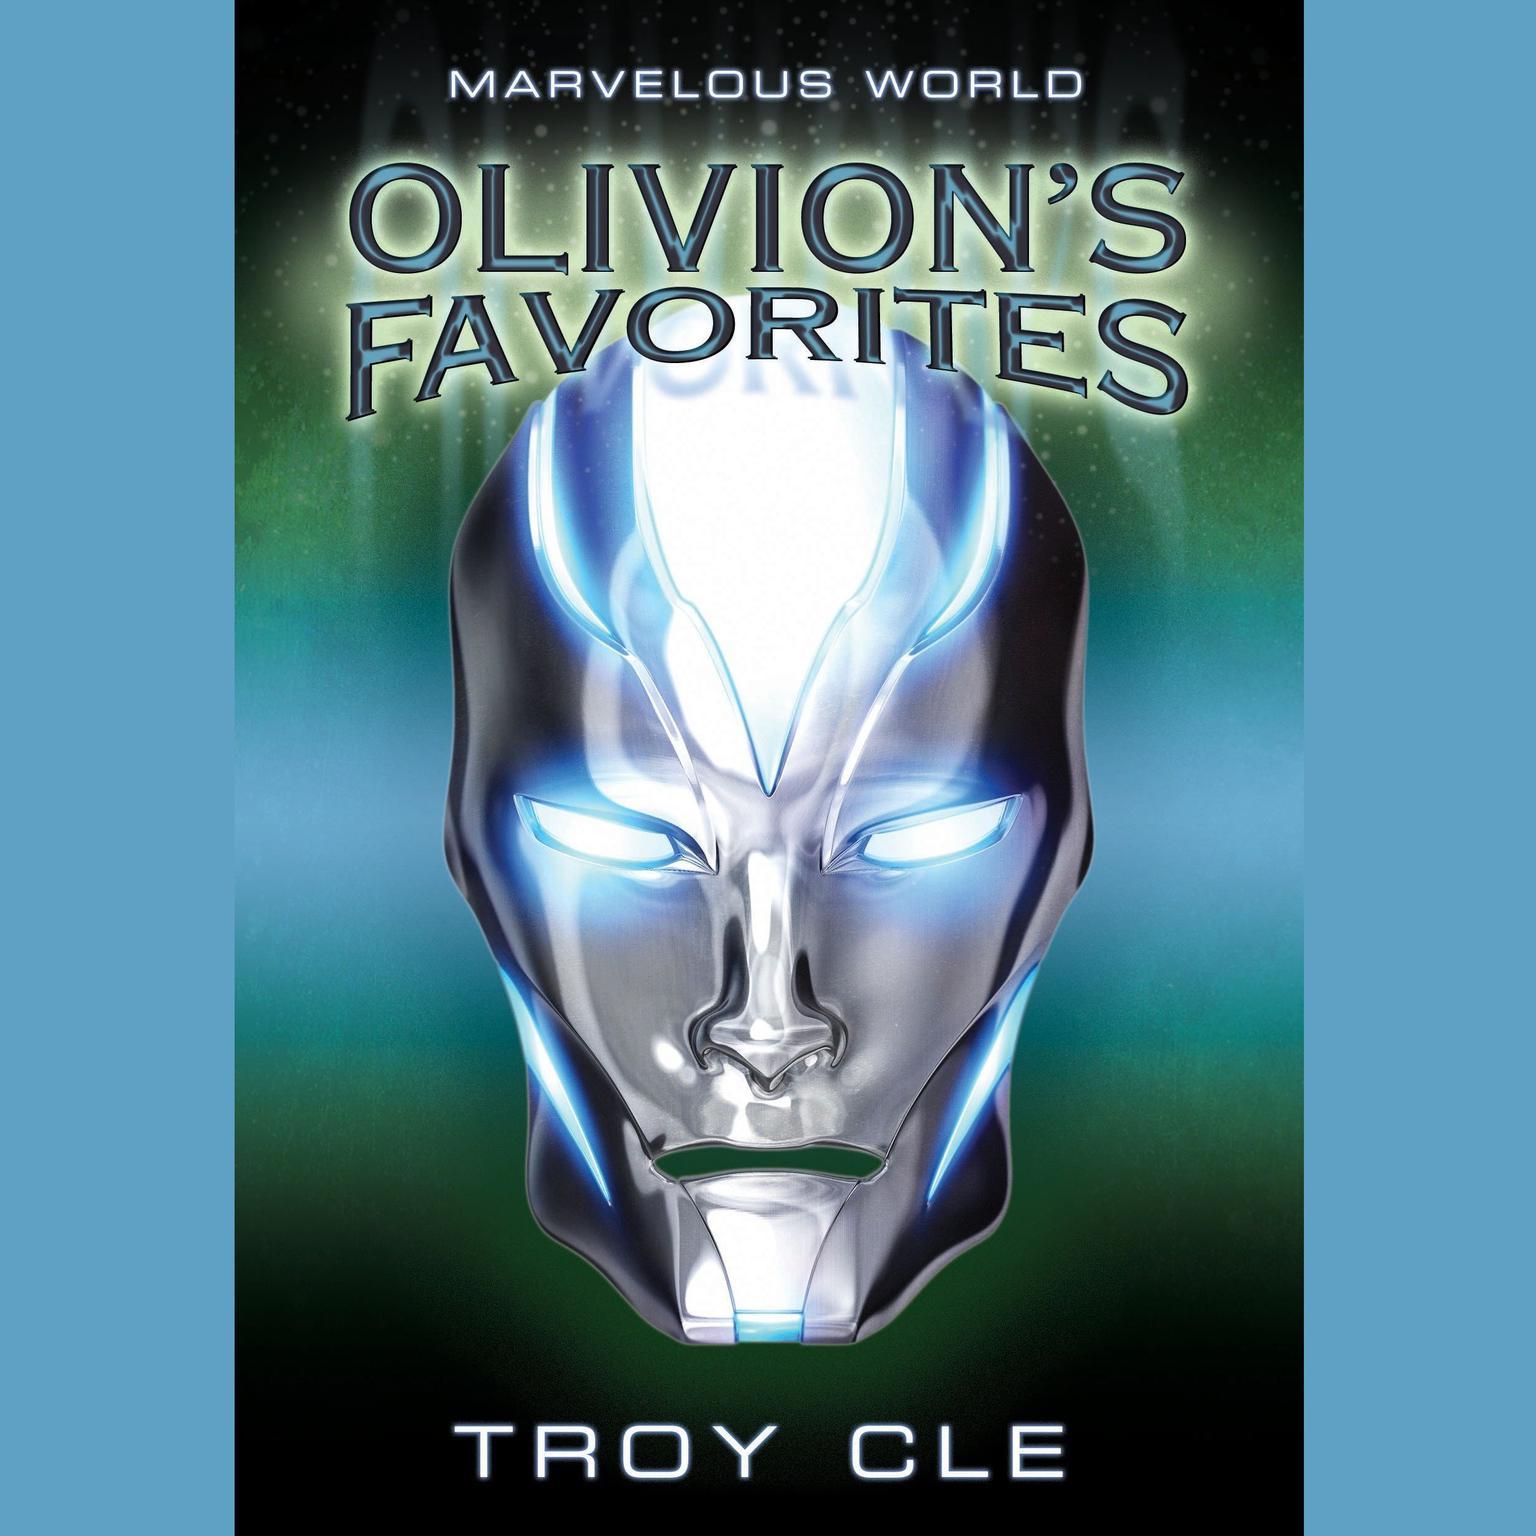 Printable Olivion's Favorites: Marvelous World, Book 2 Audiobook Cover Art